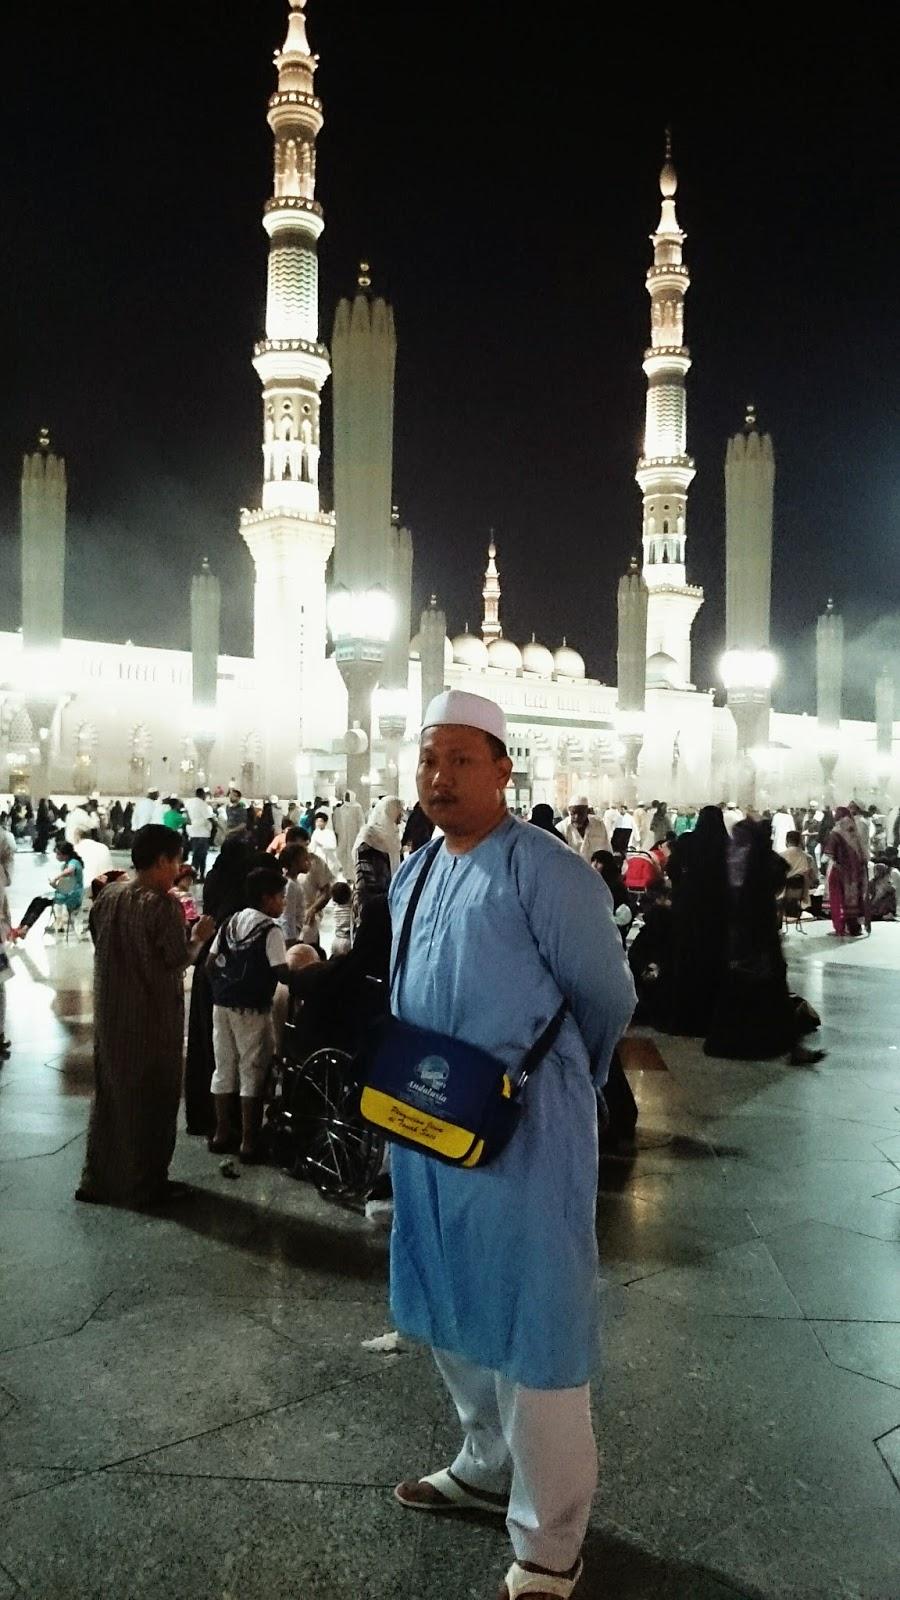 Nabawi Baju Koko Al Marwah Putih Daftar Harga Penjualan Terbaik Pria Keren Katun Coklat Kok 1735 Subahanallah Ramainya Umat Islam Solat Hari Raya Terutama Wanita Saya Dan En Suami